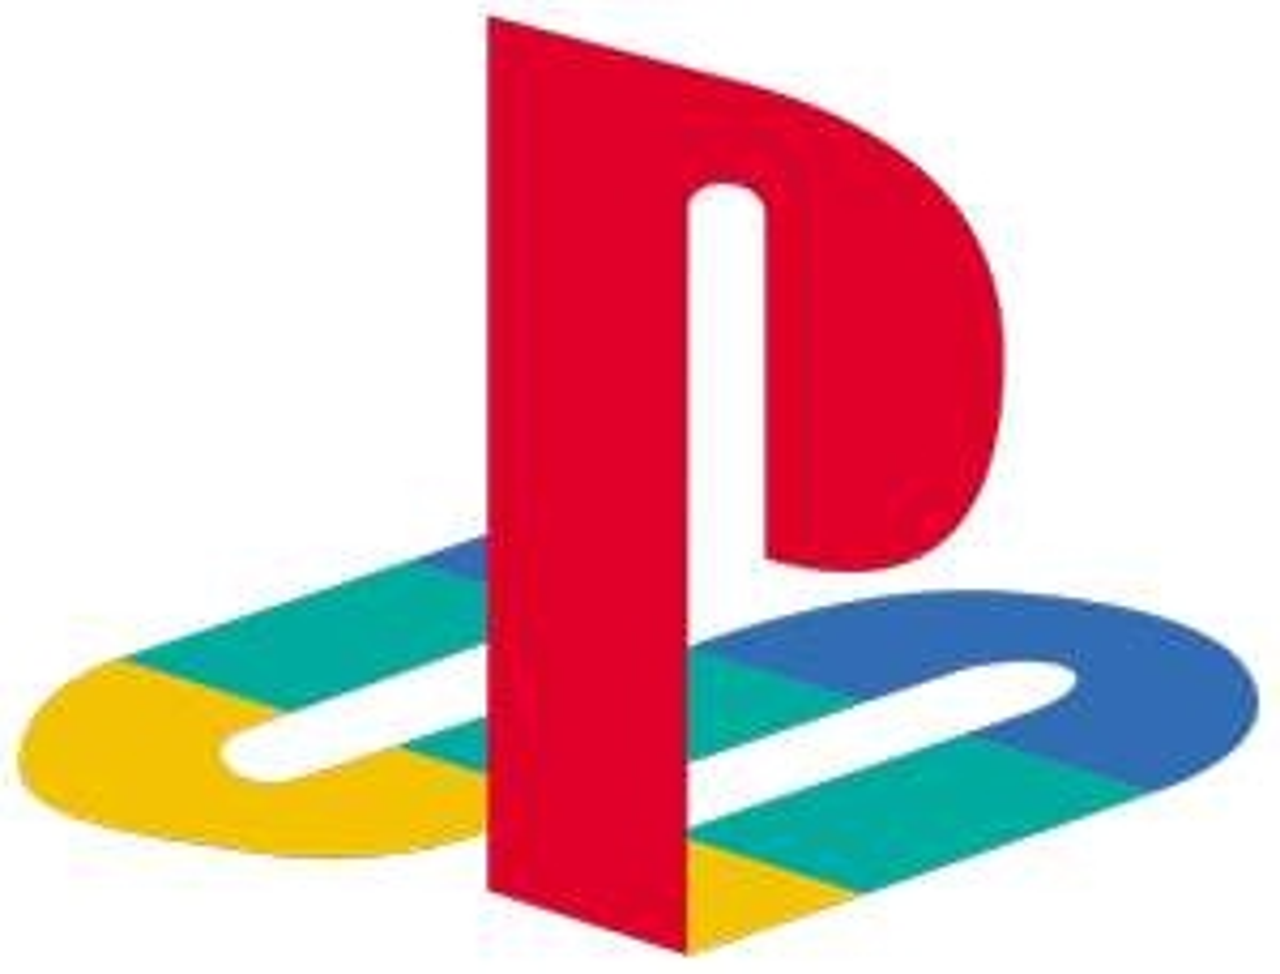 Deals at PlayStation PSN Turkey - Yakuza Kiwami 2 £11.76 Tomb Raider DE £3.78 Sniper Elite 4 £8.96 Yakuza 6 £15.96 Trials Rising £7.84 +MORE